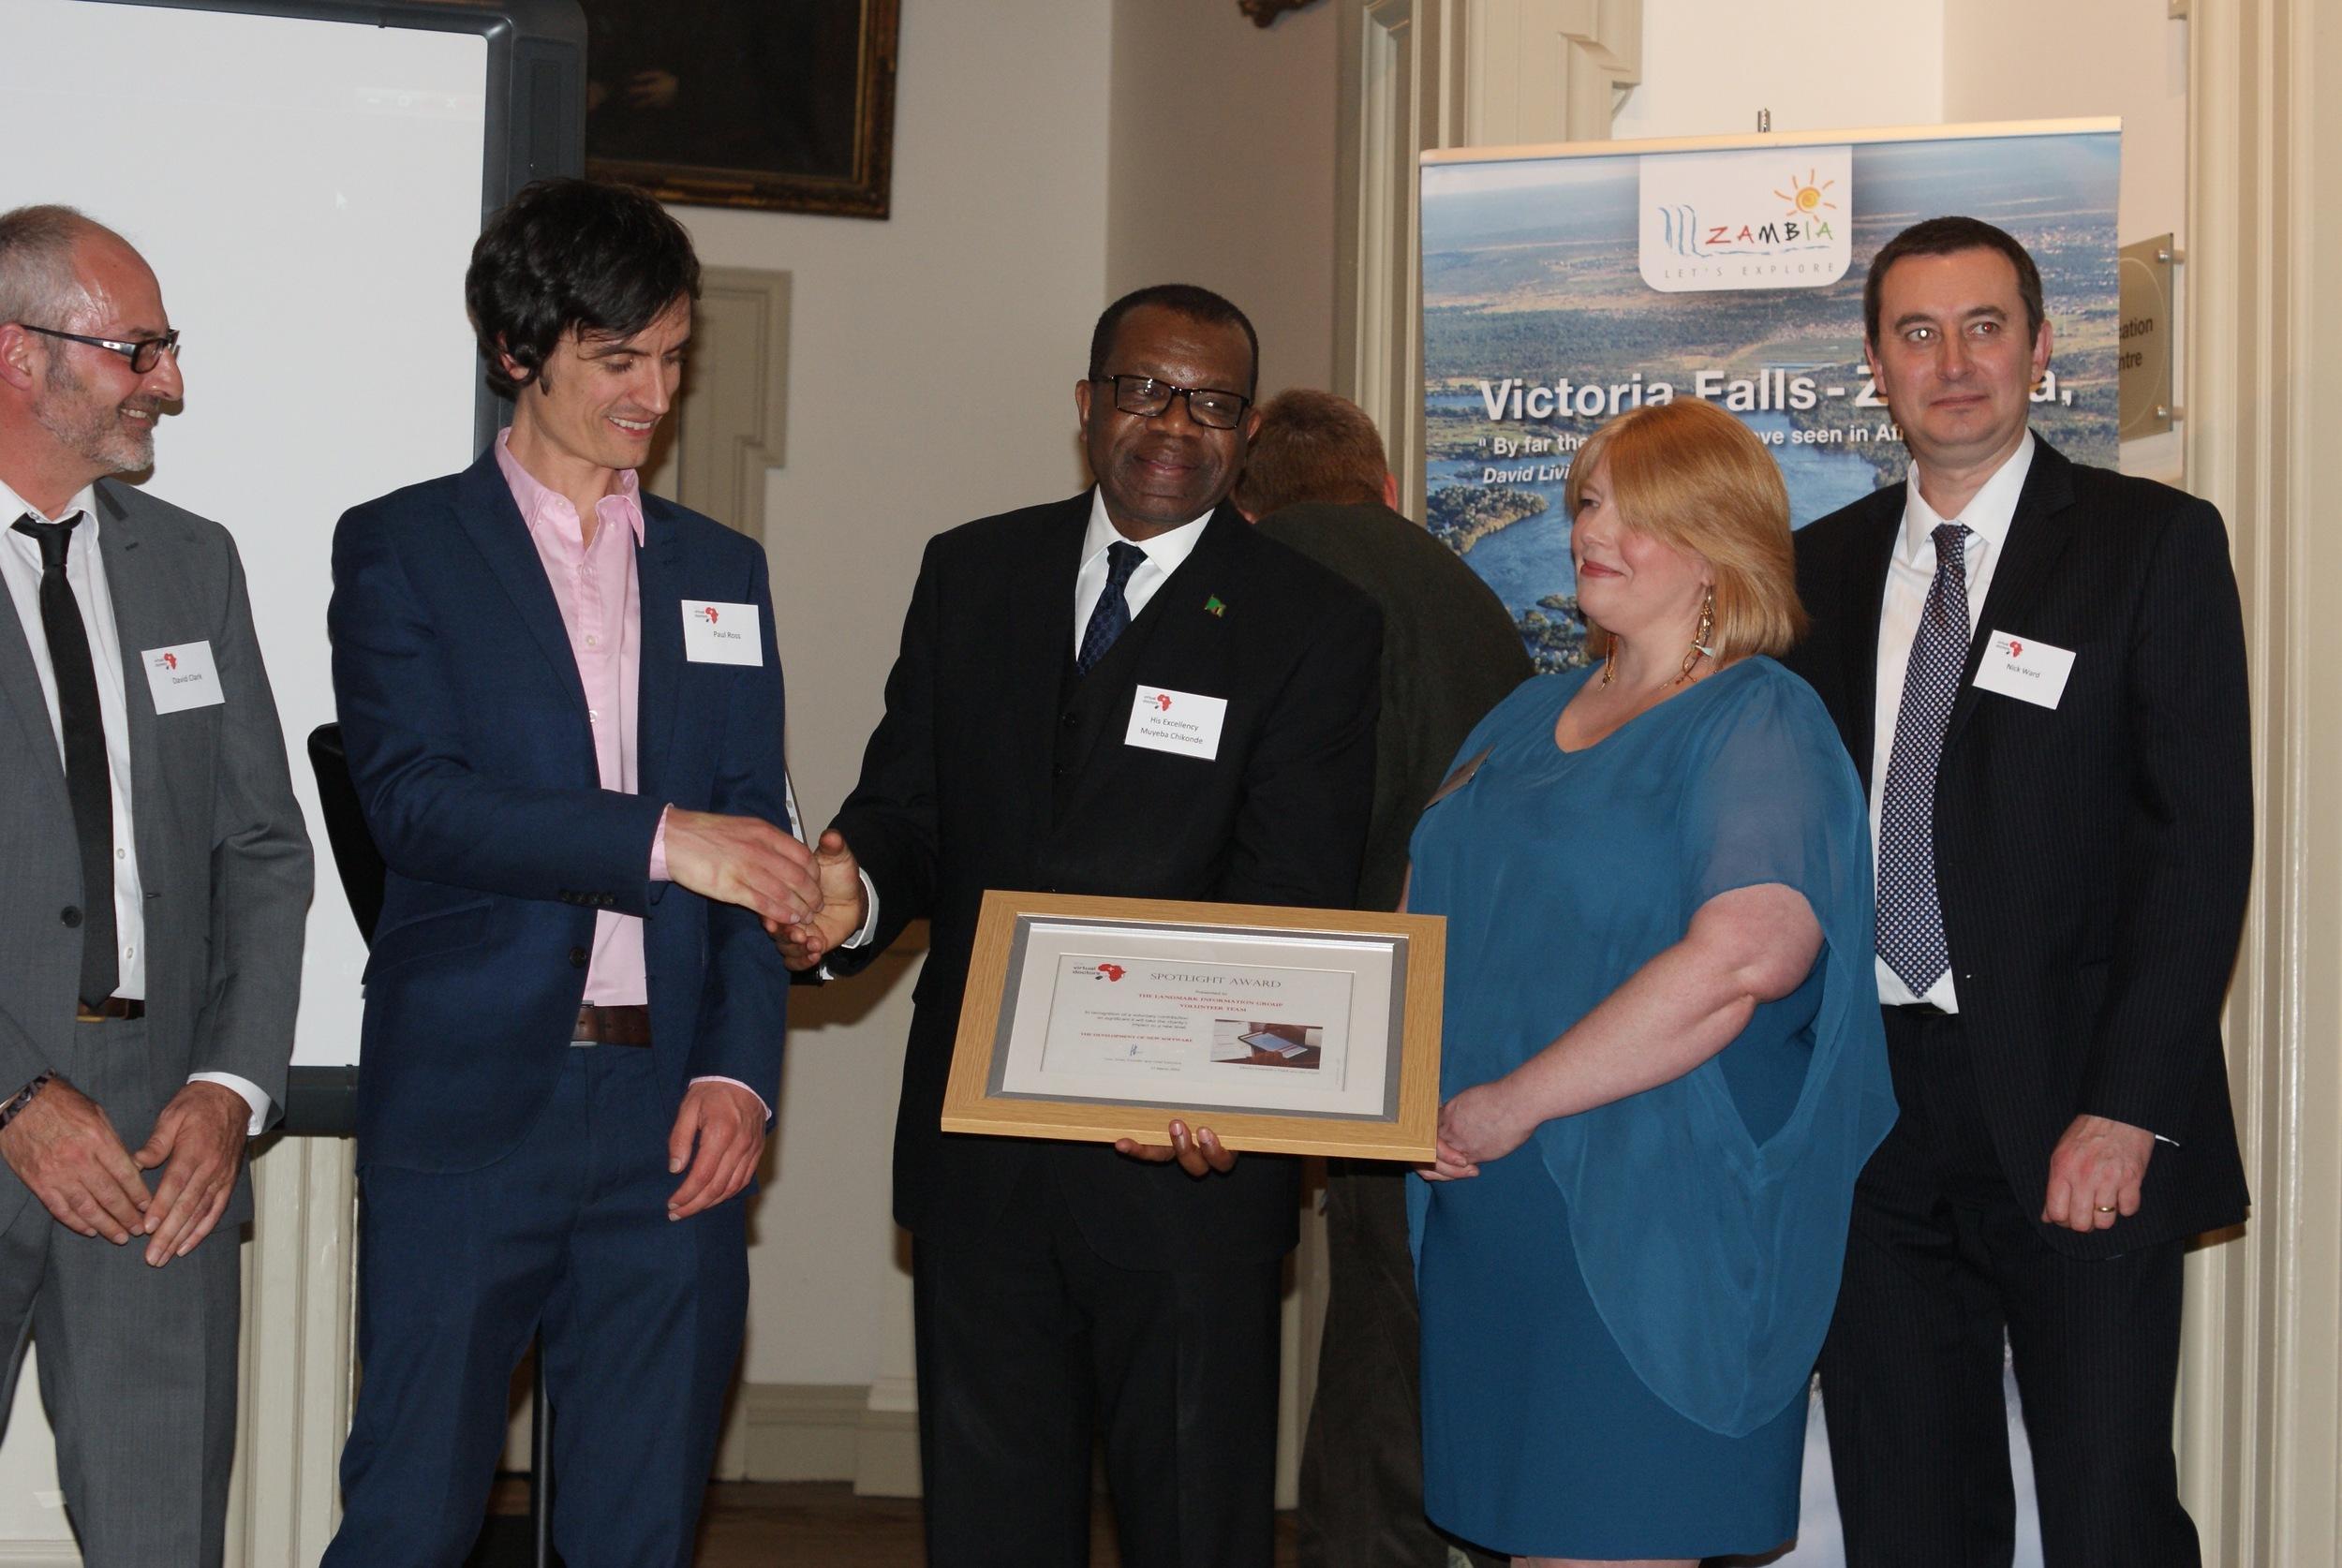 His Excellency presents the Spotlight Award to the Landmark team